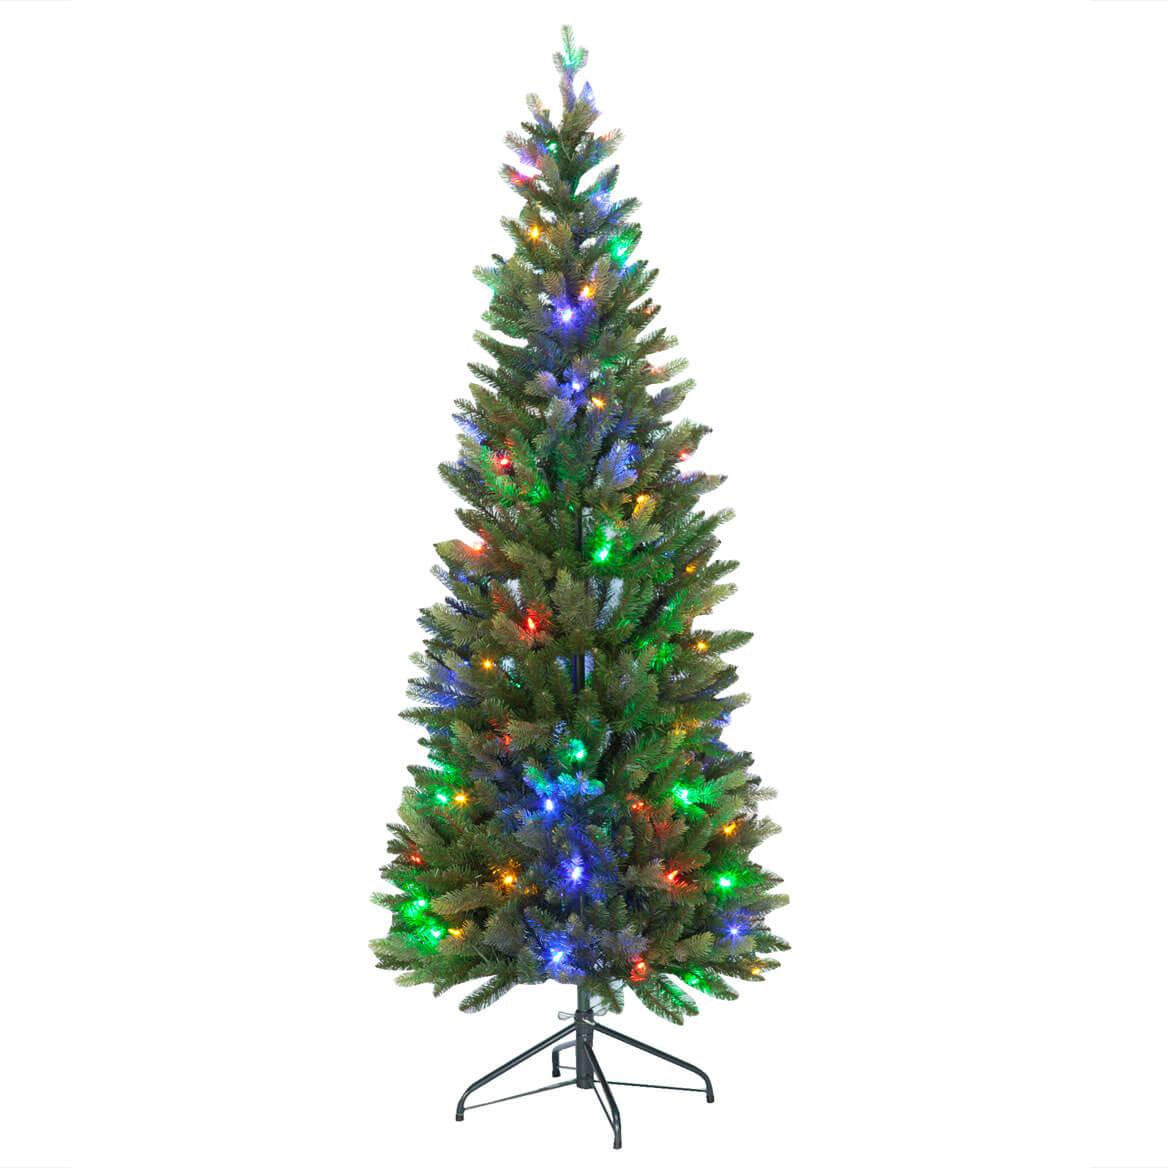 6-Foot Pre-Lit Frasier Tree - Pre-Lit Christmas Tree - Miles Kimball